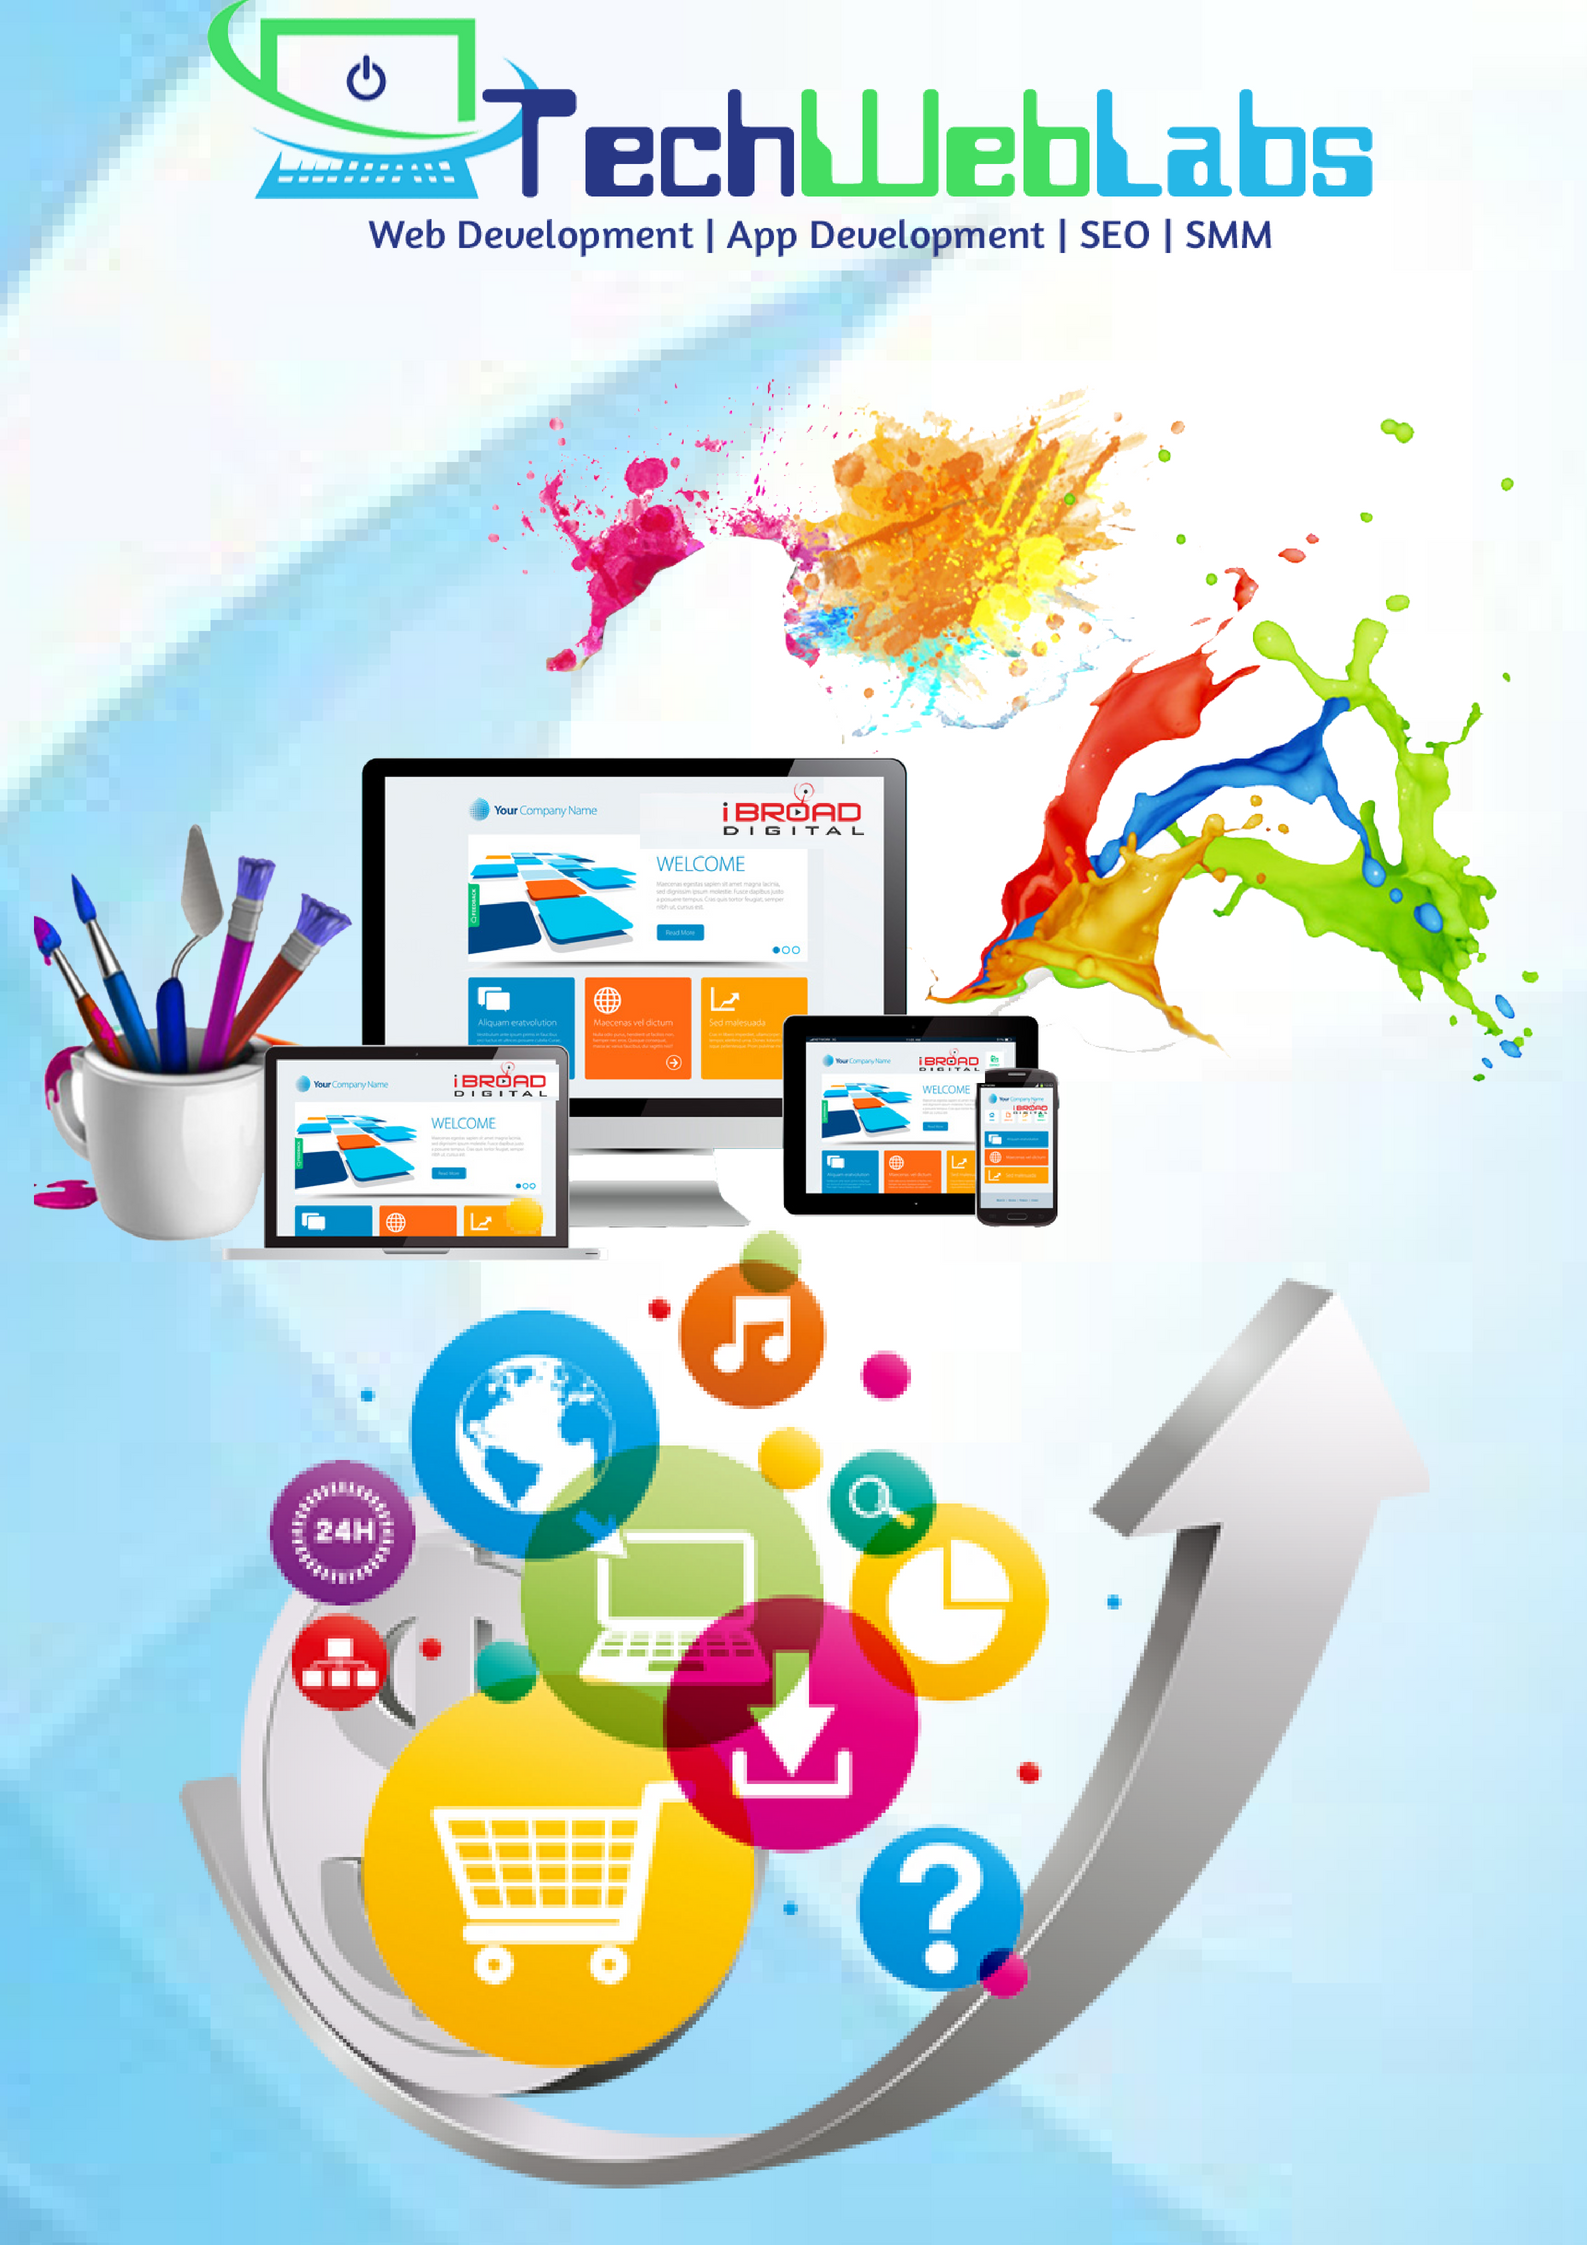 e-commerce website and app development